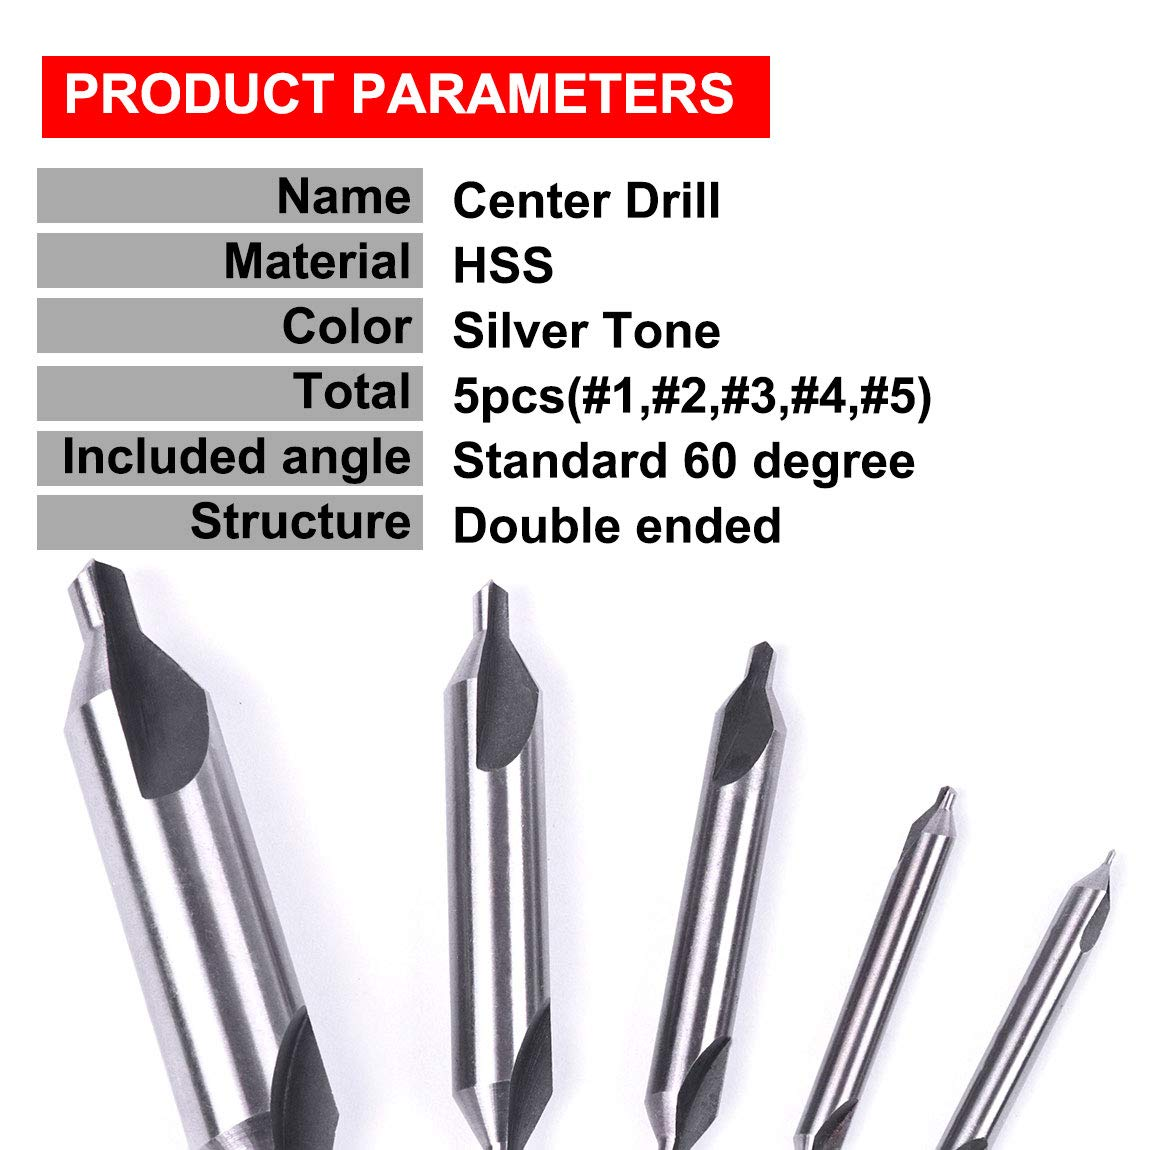 Hot Selling 5 Pcs HSS Center Drills 60 P20 Tool Set Tip Bit Angle Countersinks